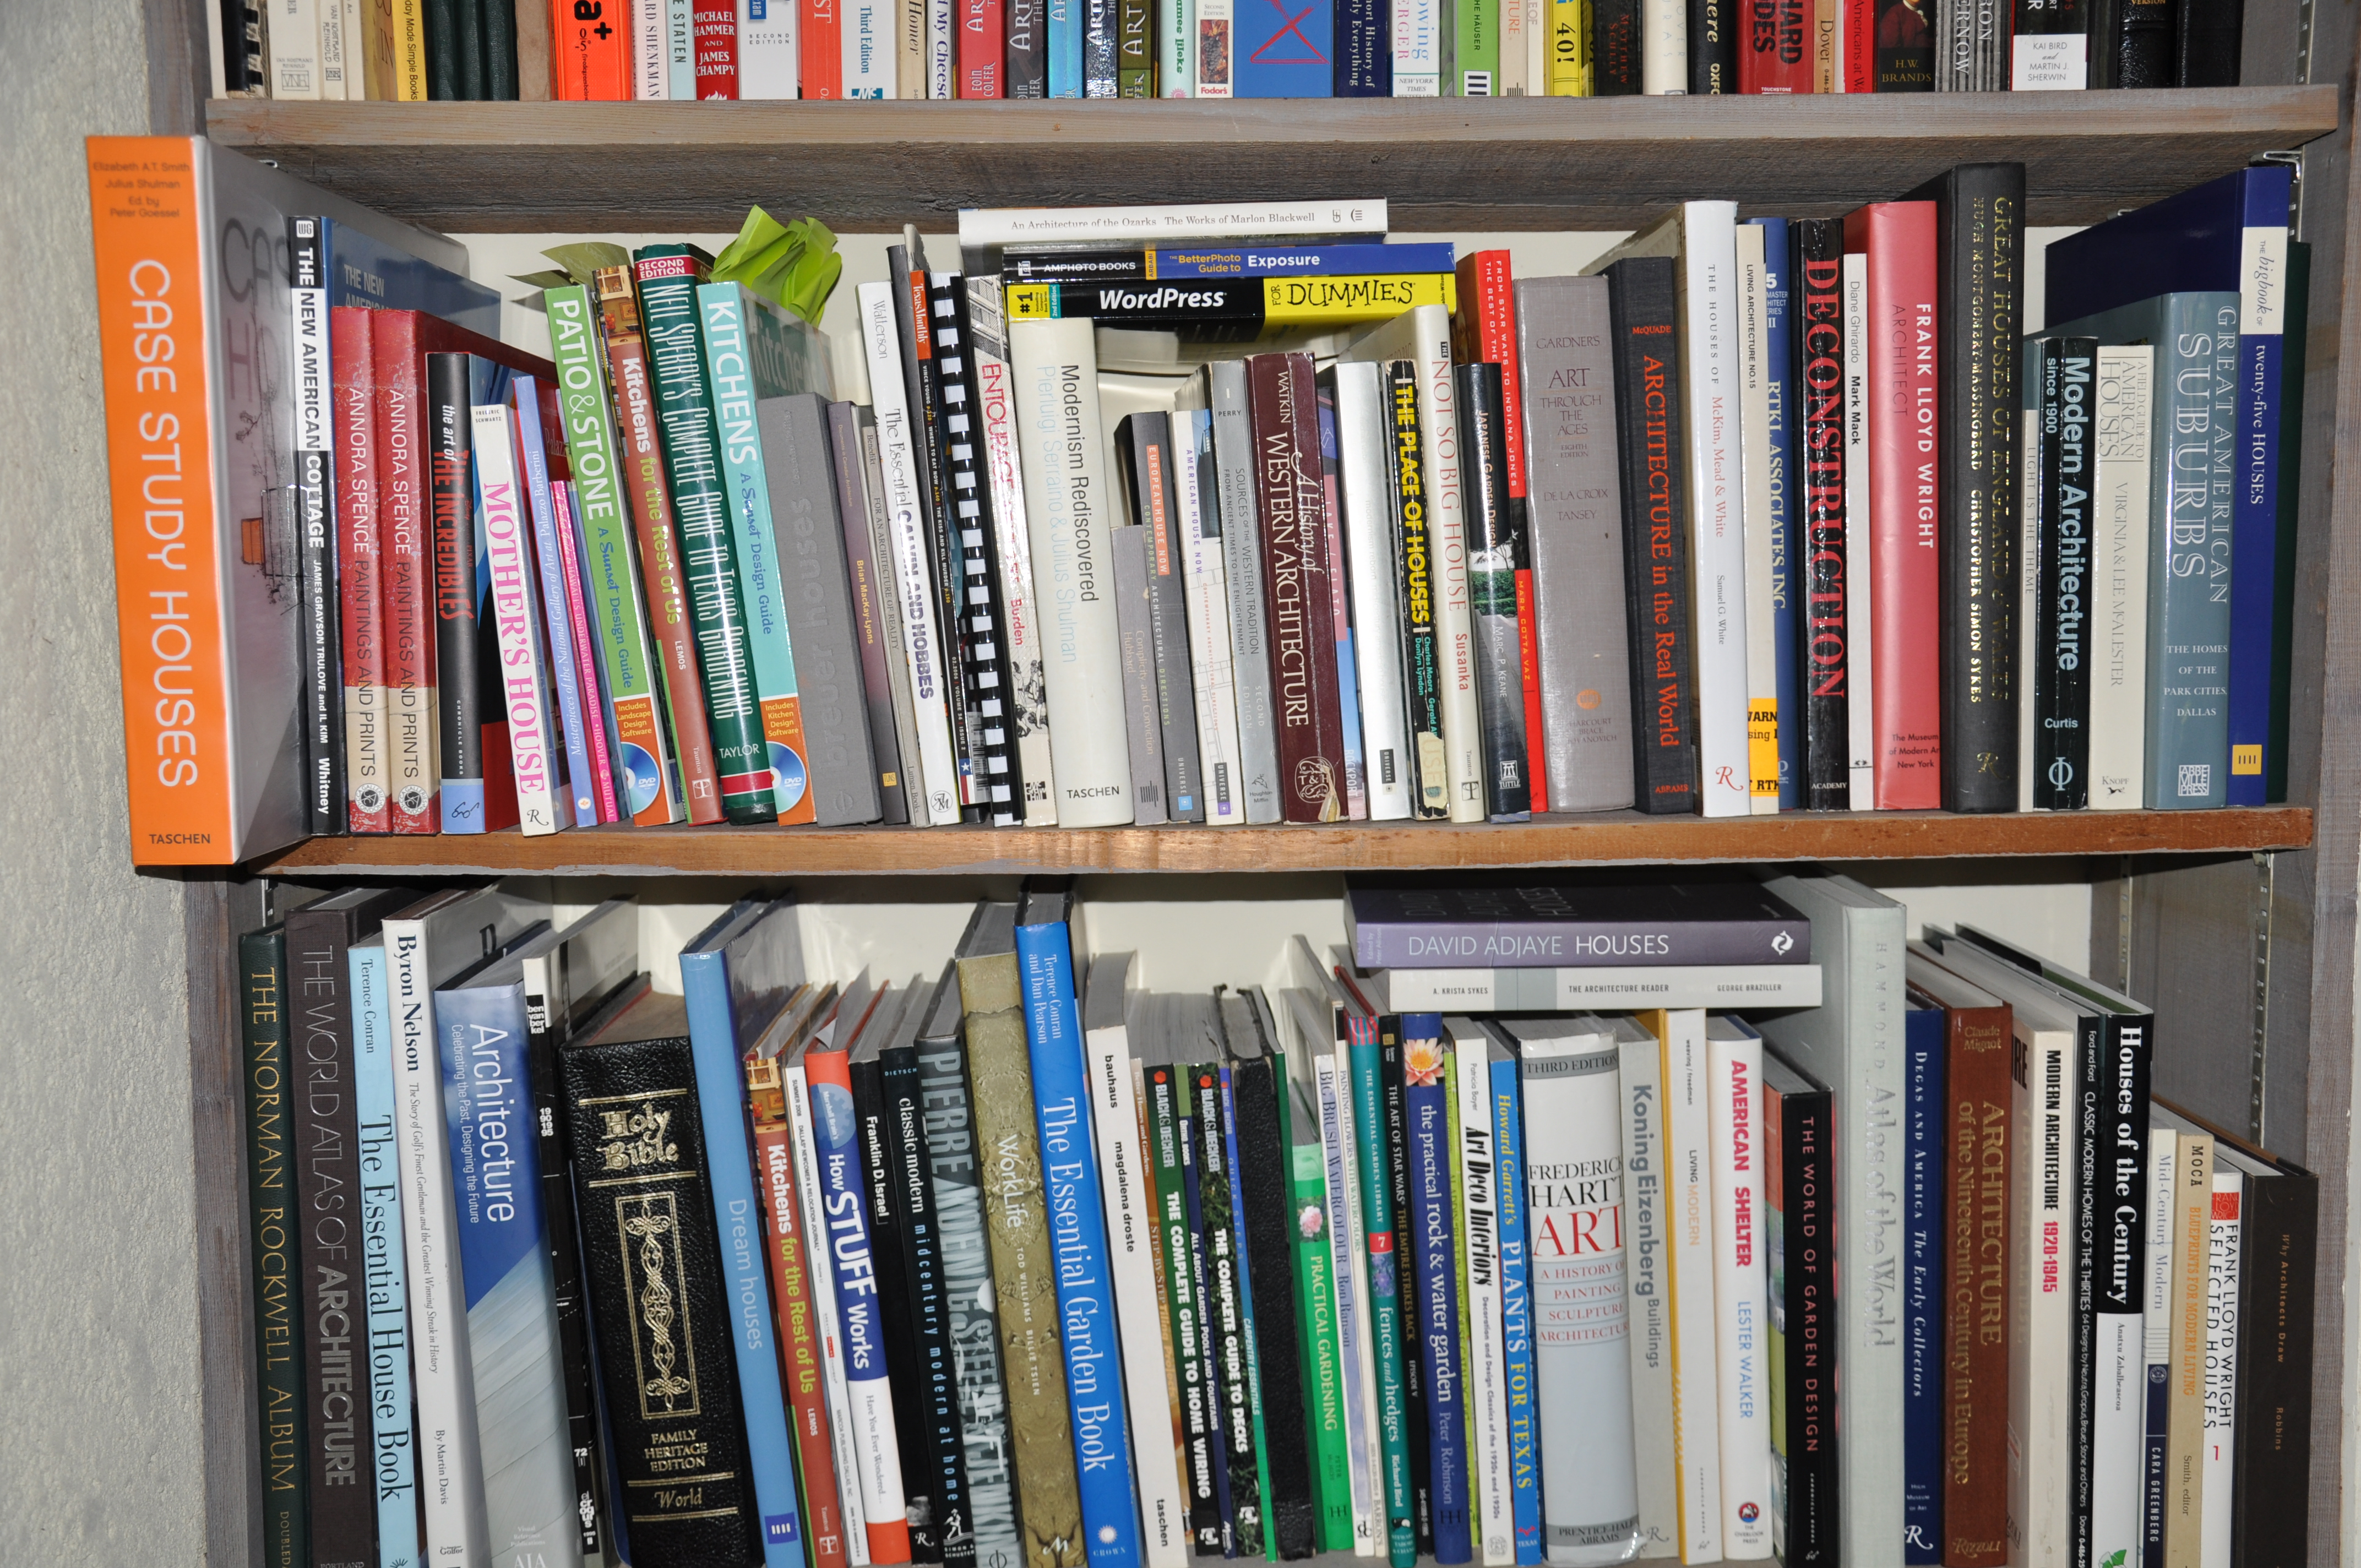 Buy My Books Online - Best Books 2017